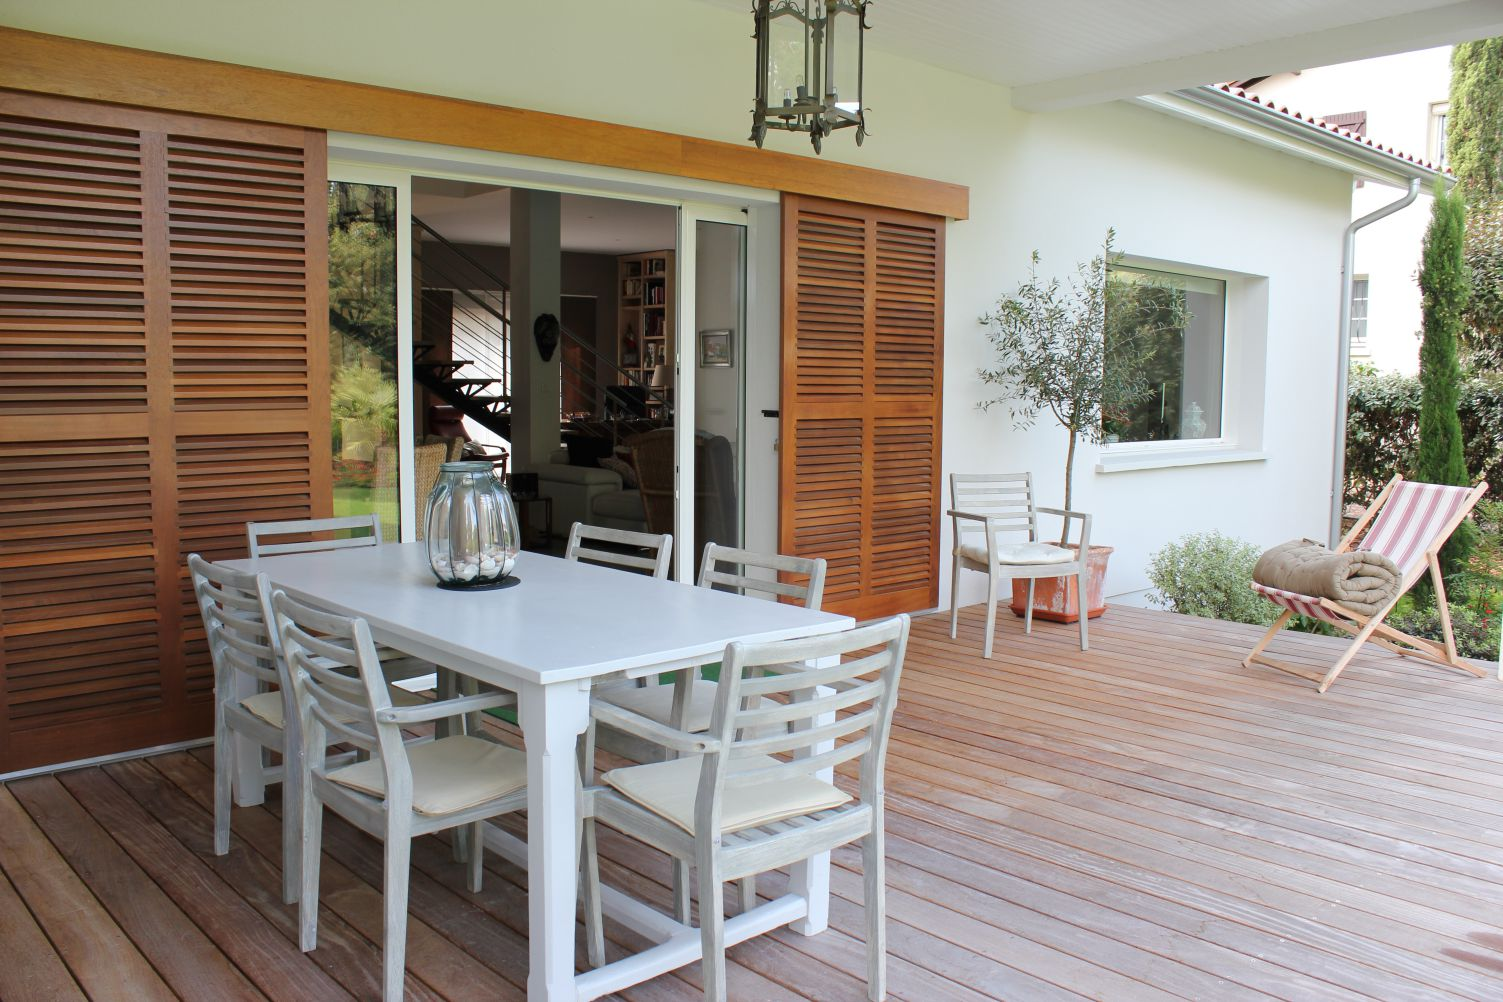 maison igc avec terrasse bois